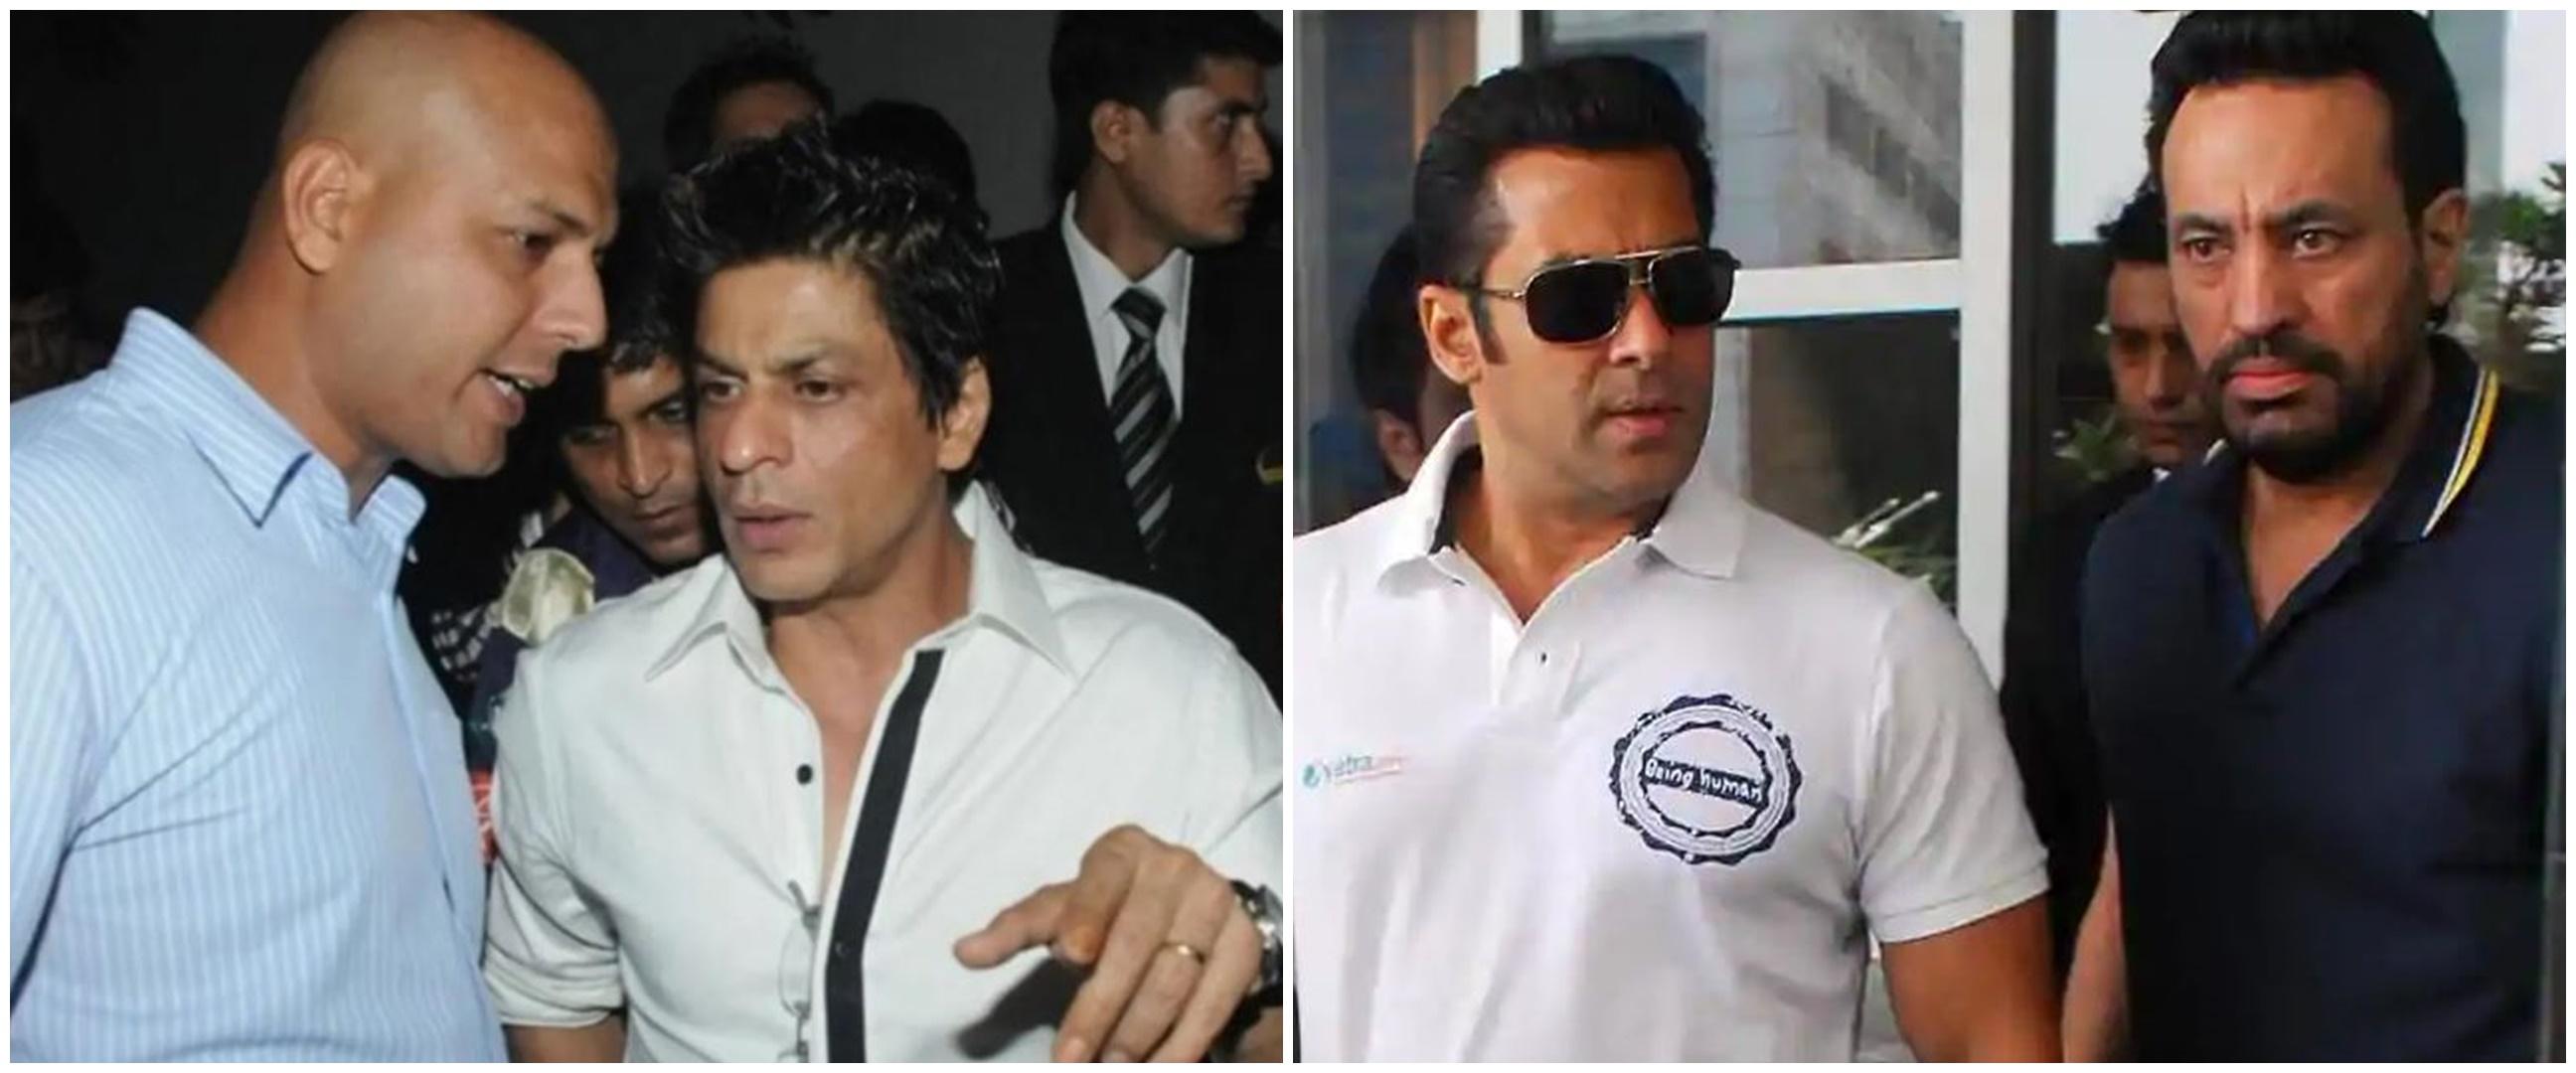 Intip gaji 5 bodyguard seleb Bollywood, miliaran rupiah per tahun